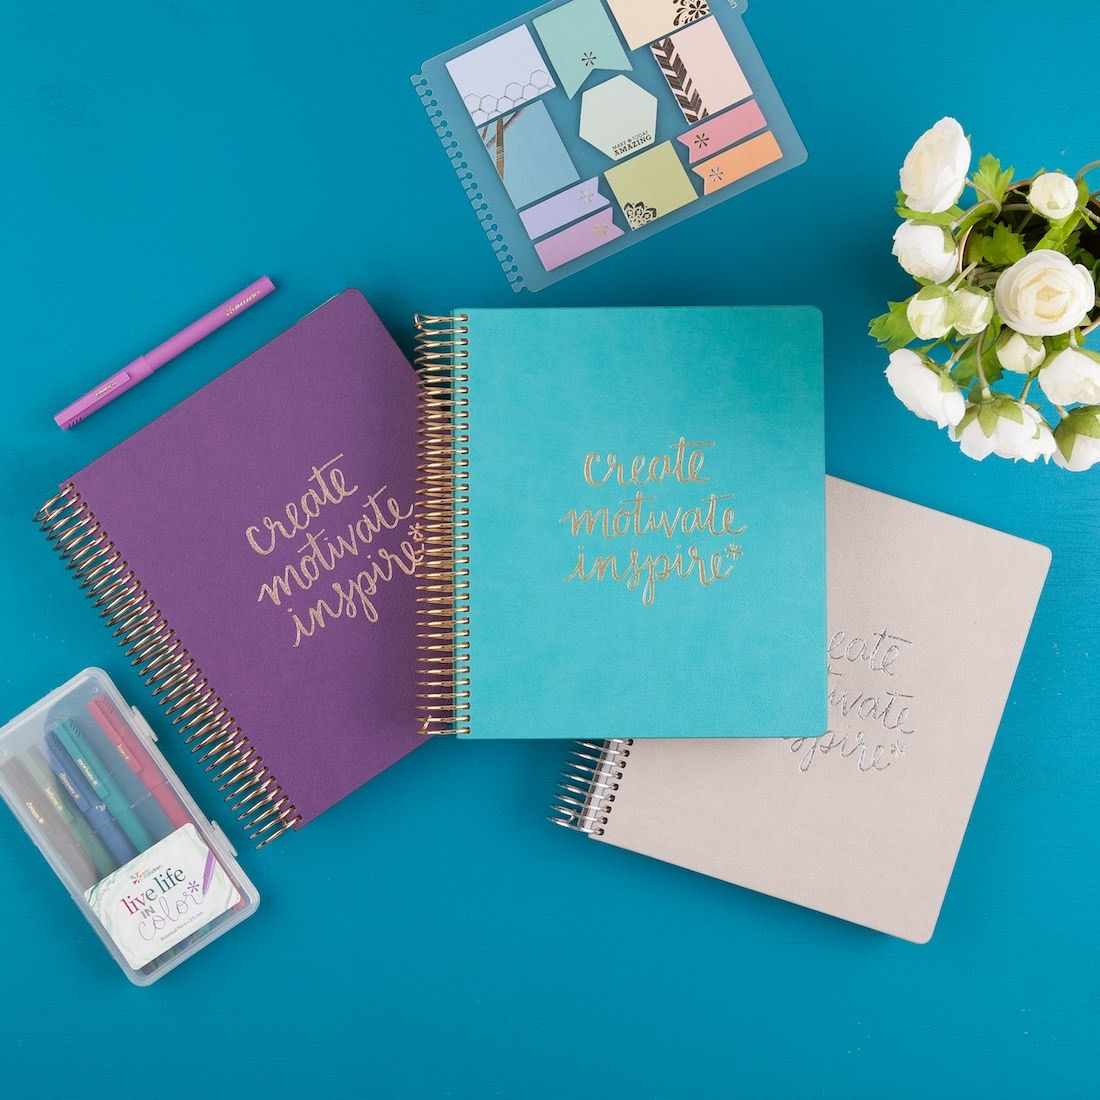 Homework biography business plan dissertation essay